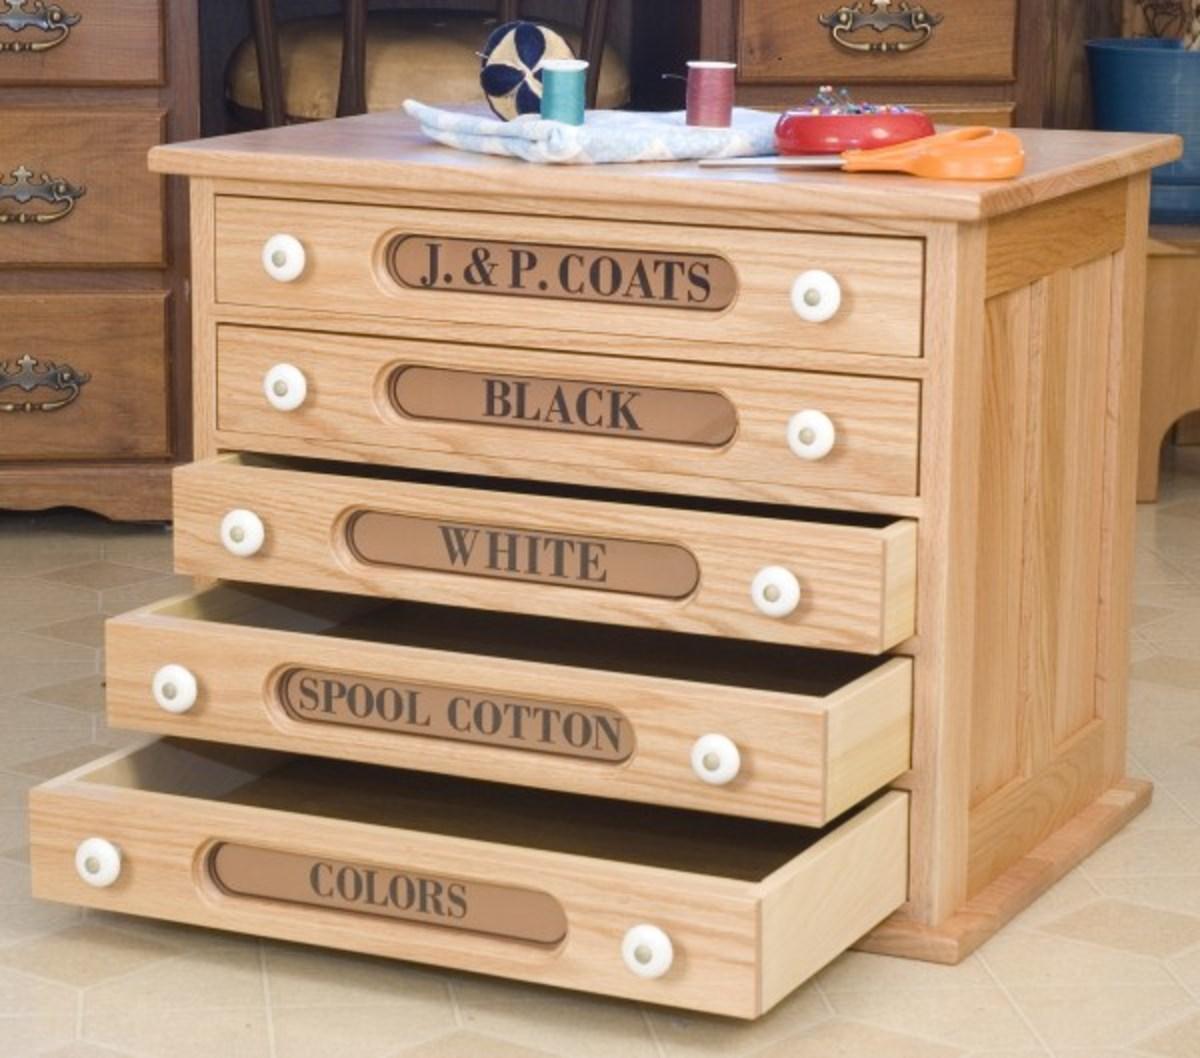 J & P Coats Reproduction Cabinet